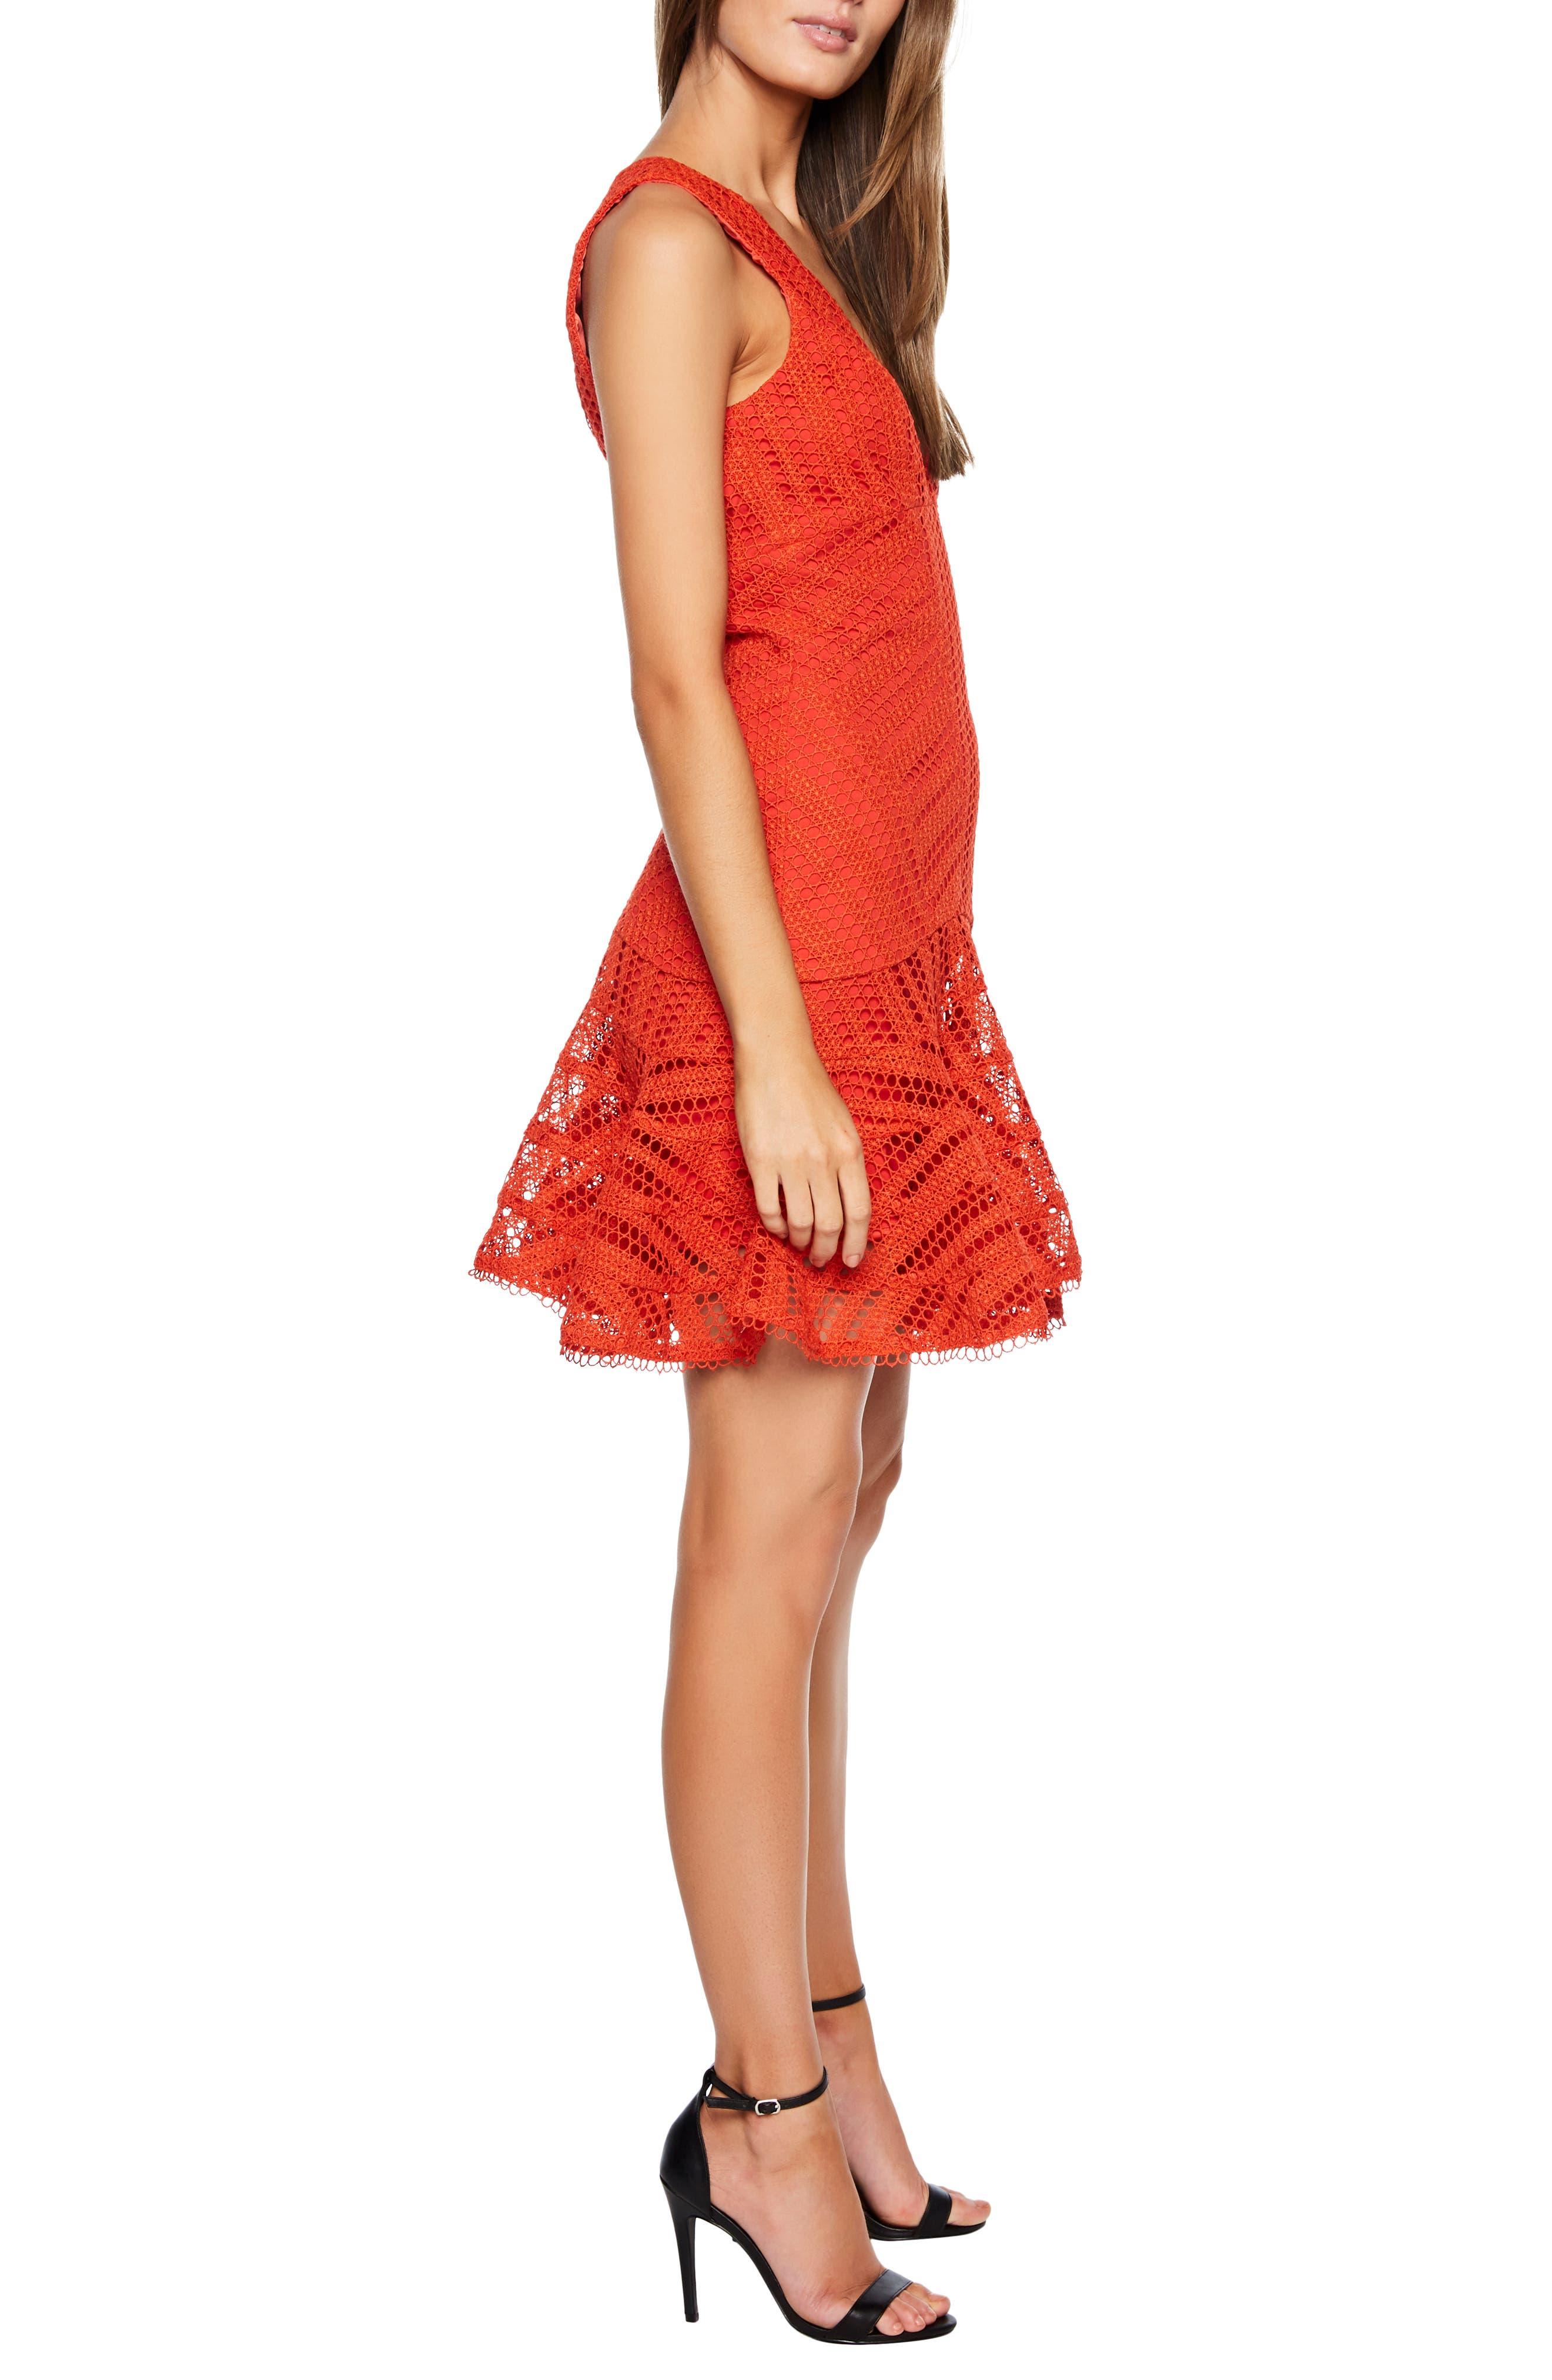 BARDOT,                             Fiesta Lace Cocktail Dress,                             Alternate thumbnail 3, color,                             FIESTA ORANGE